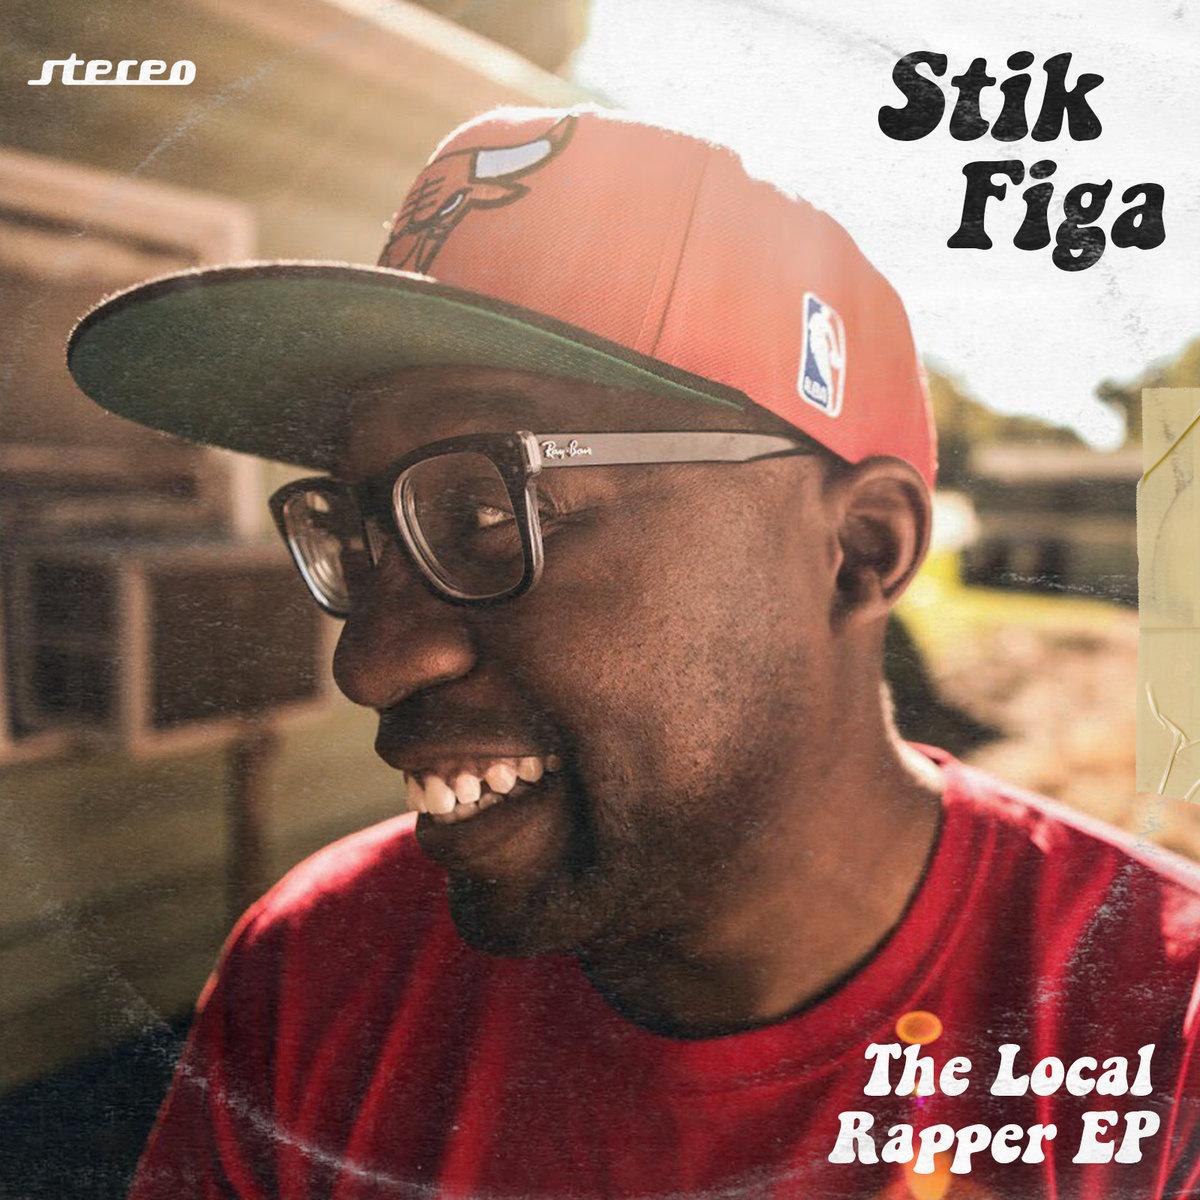 The_local_rapper_ep